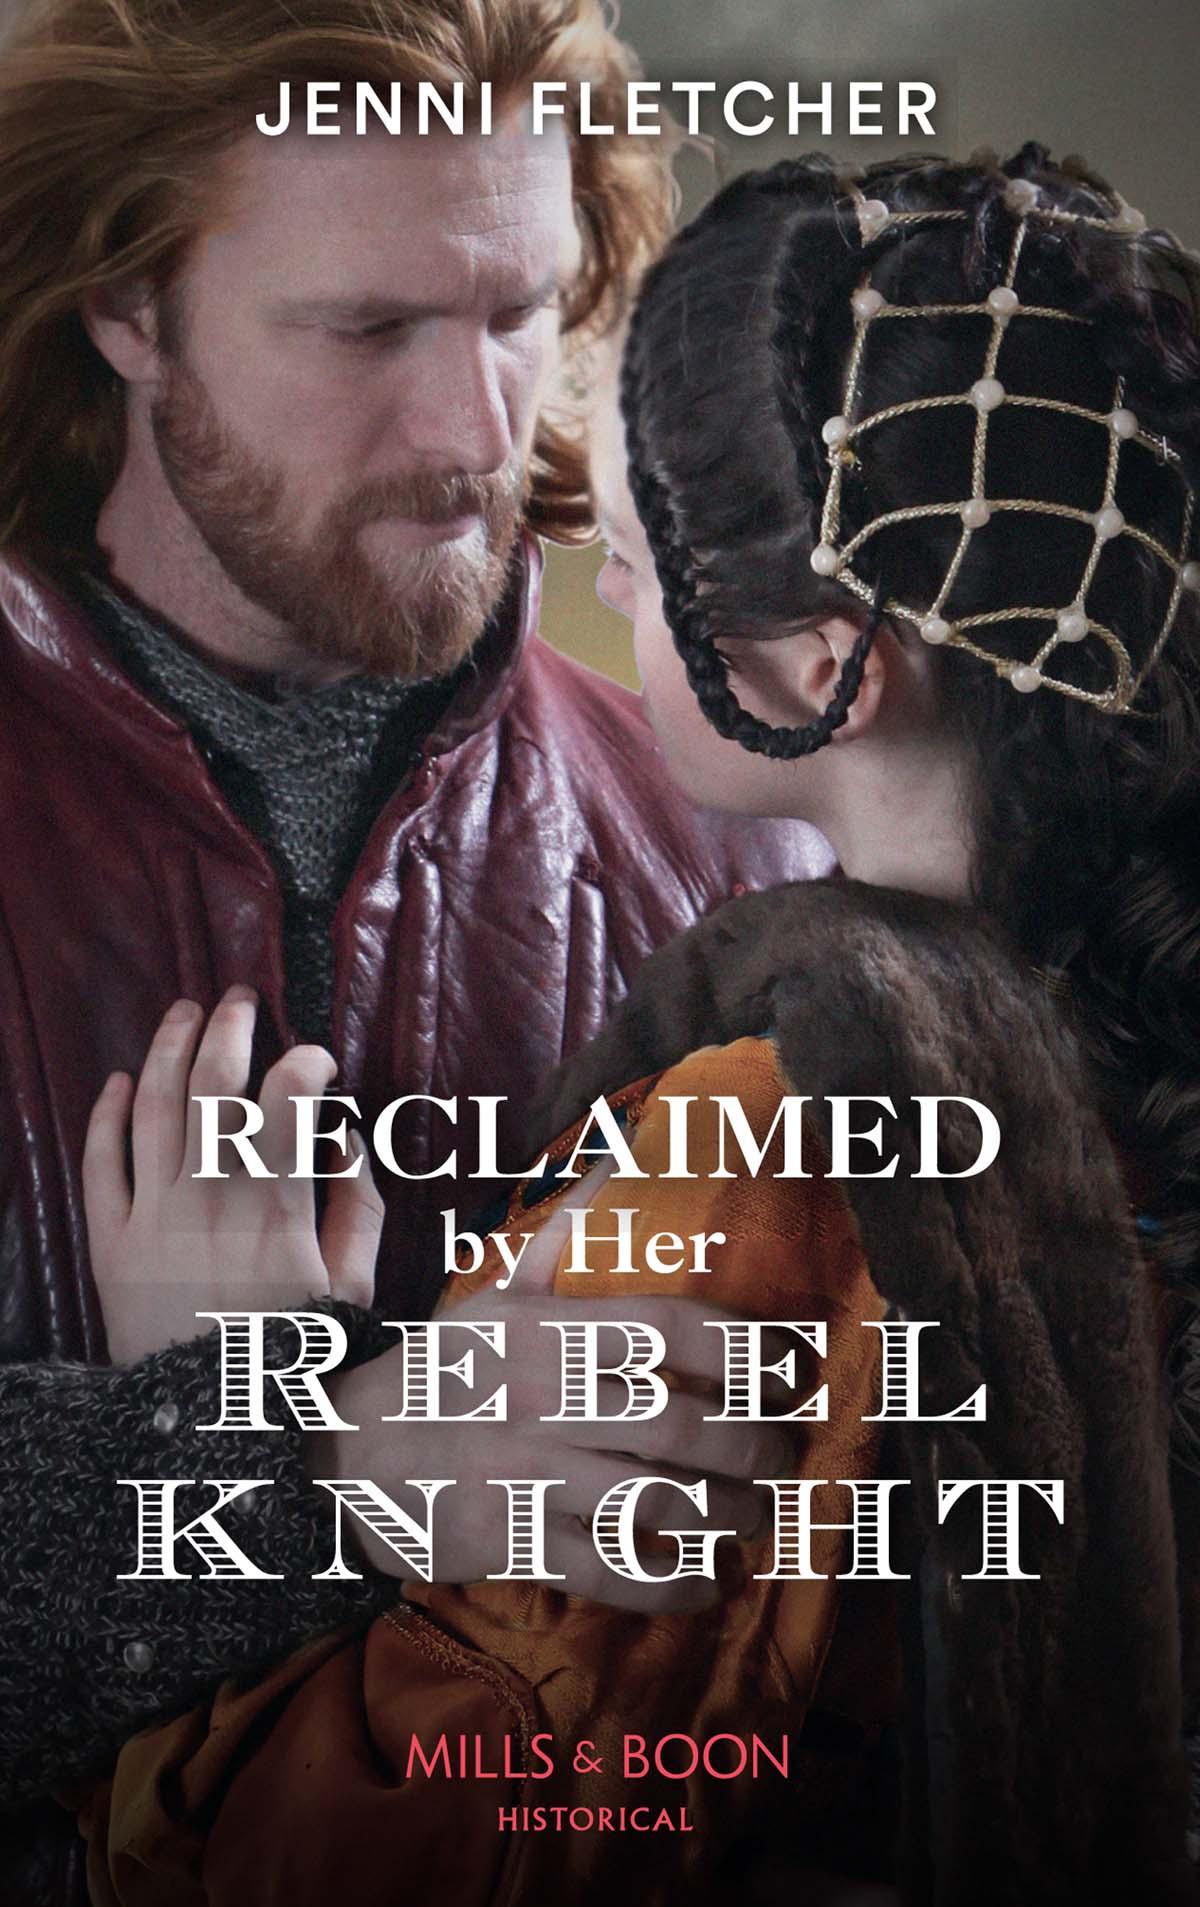 Jenni Fletcher Reclaimed By Her Rebel Knight